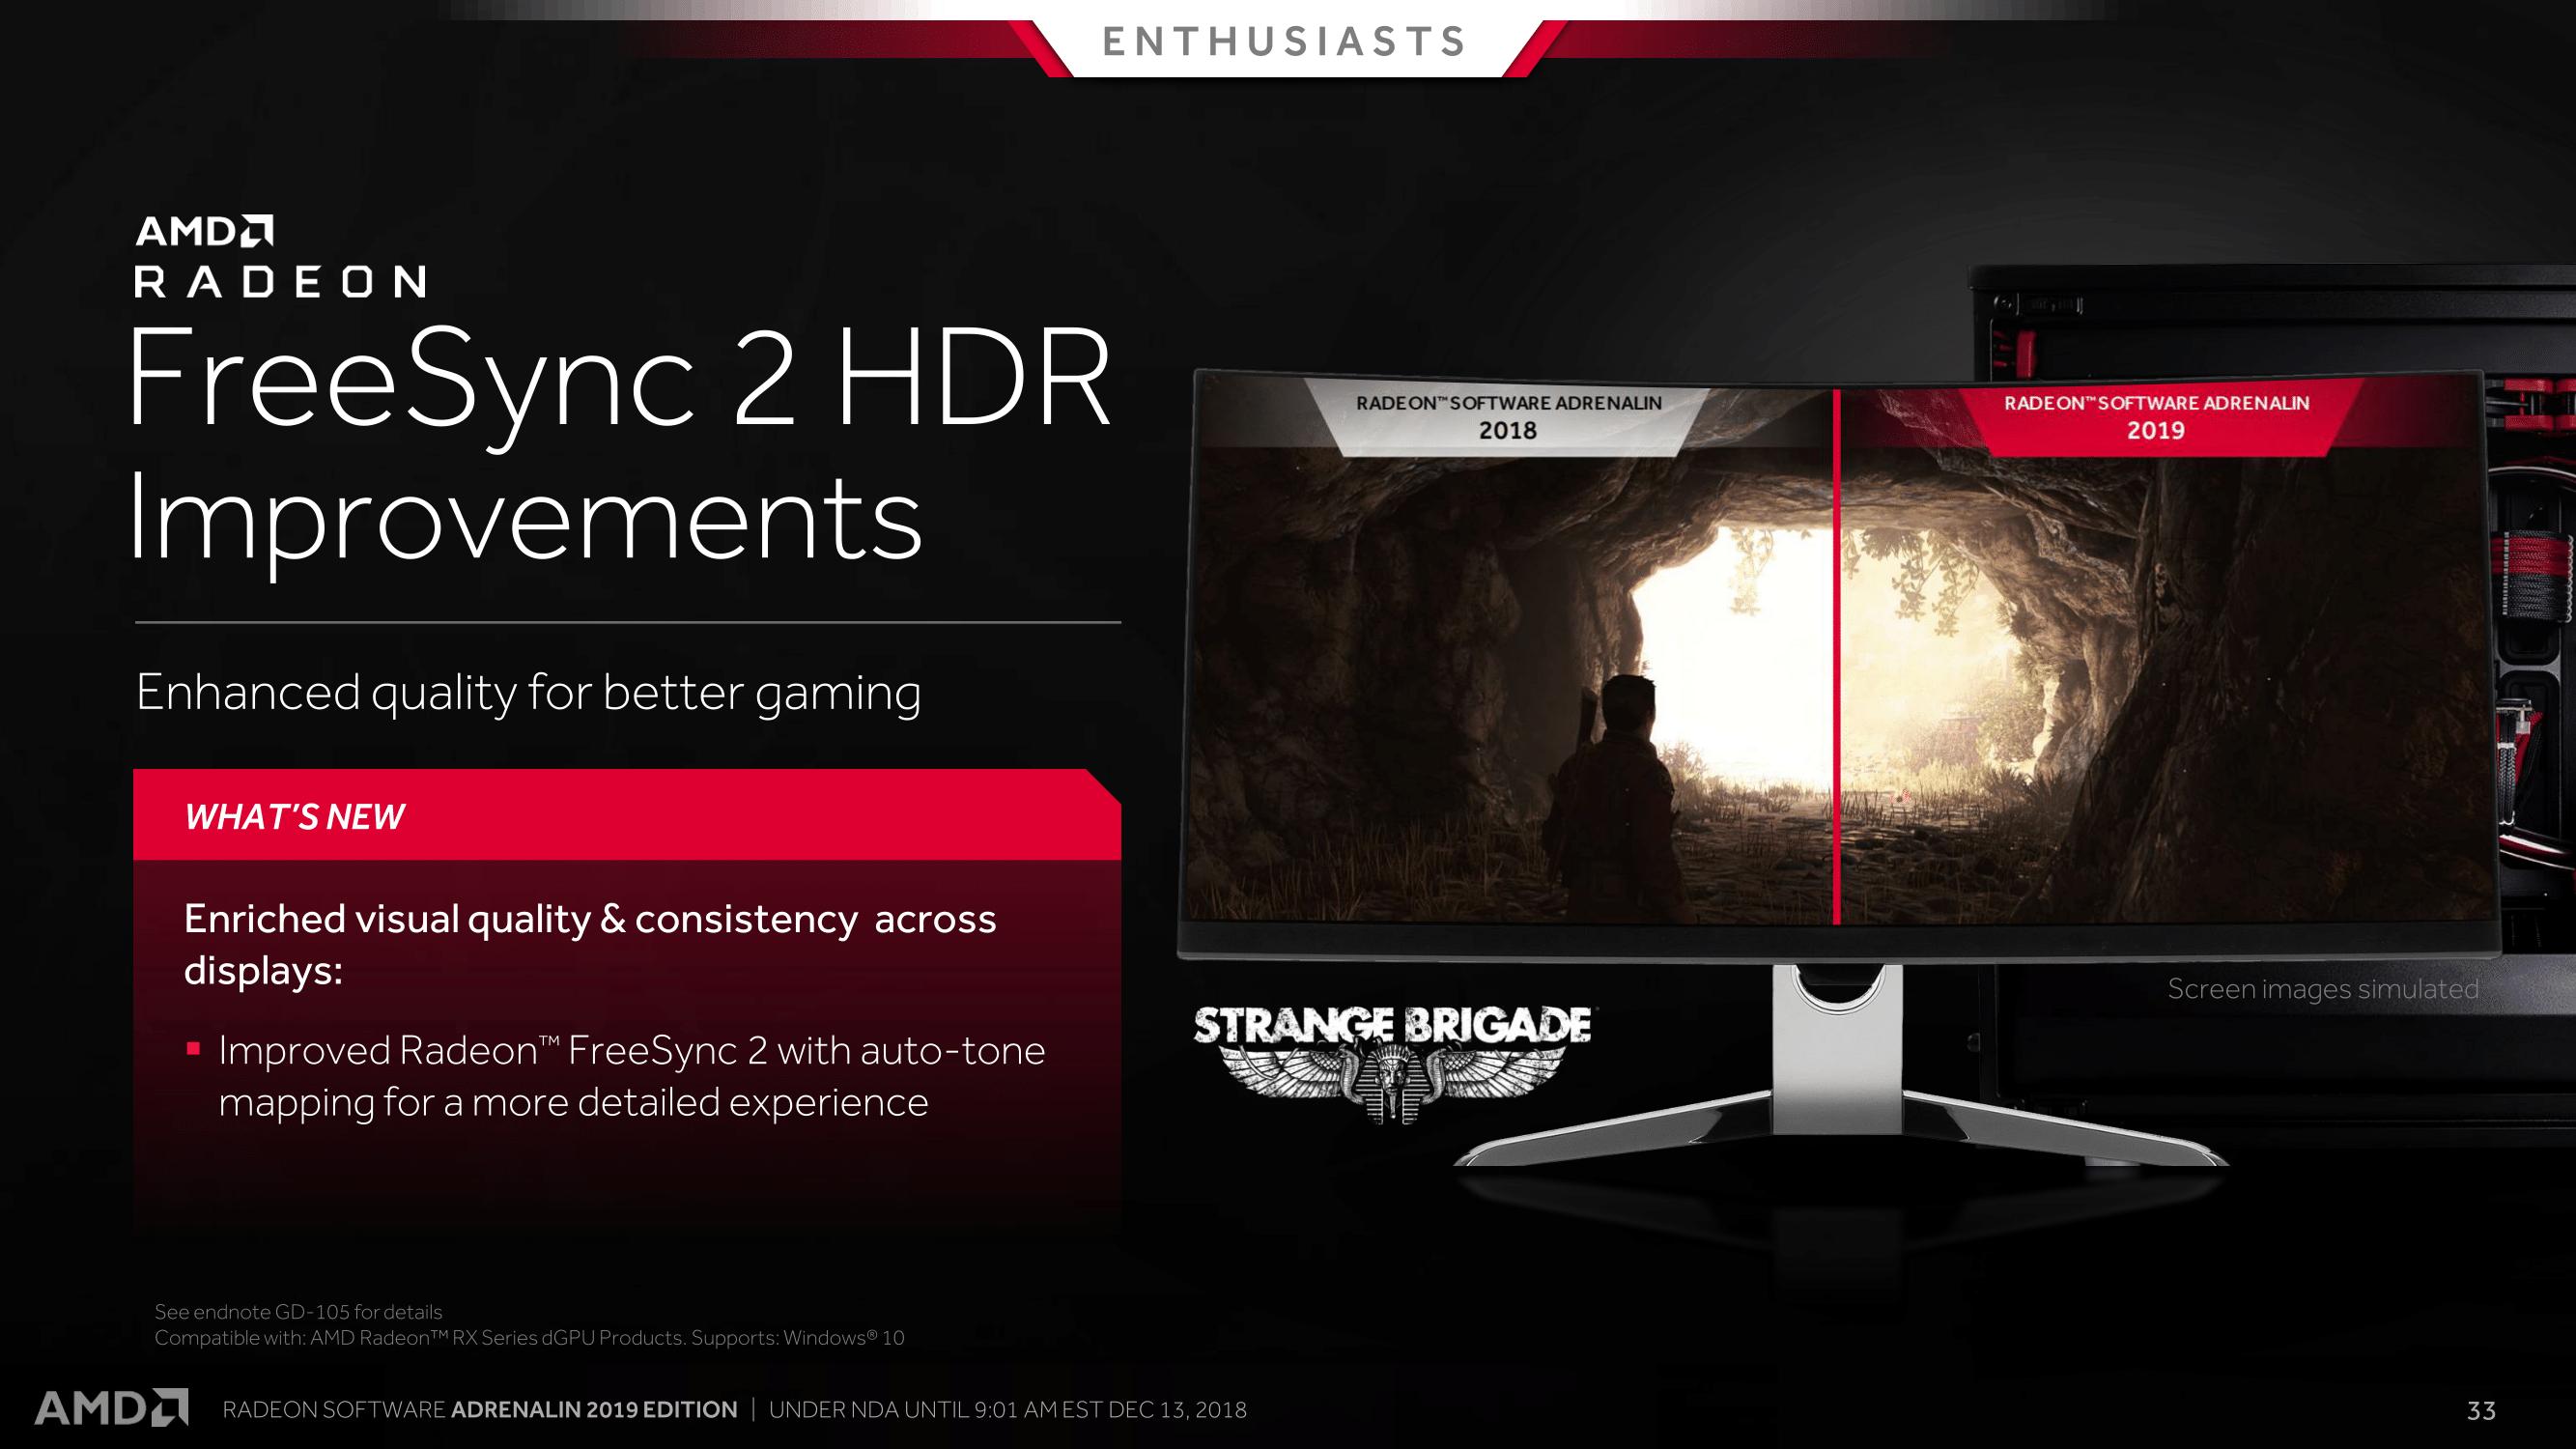 FreeSync 2 HDR